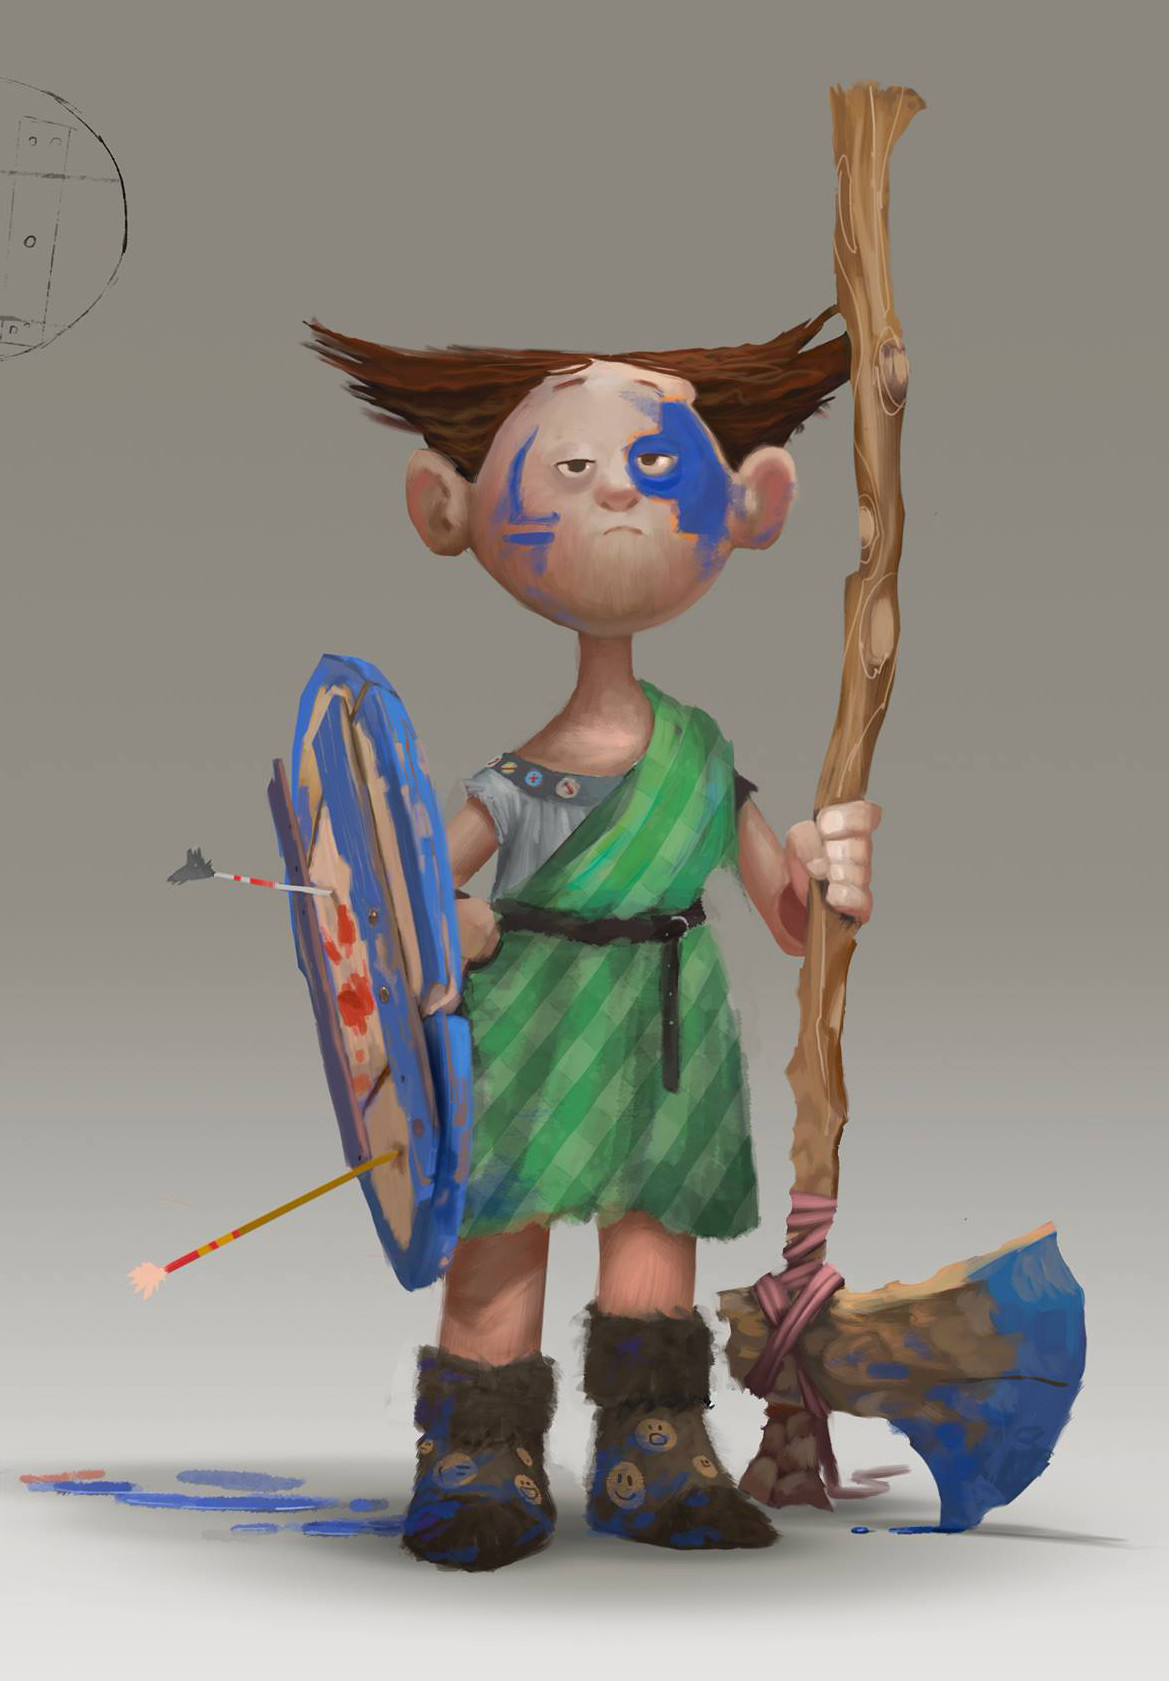 Thales simonato viking concept